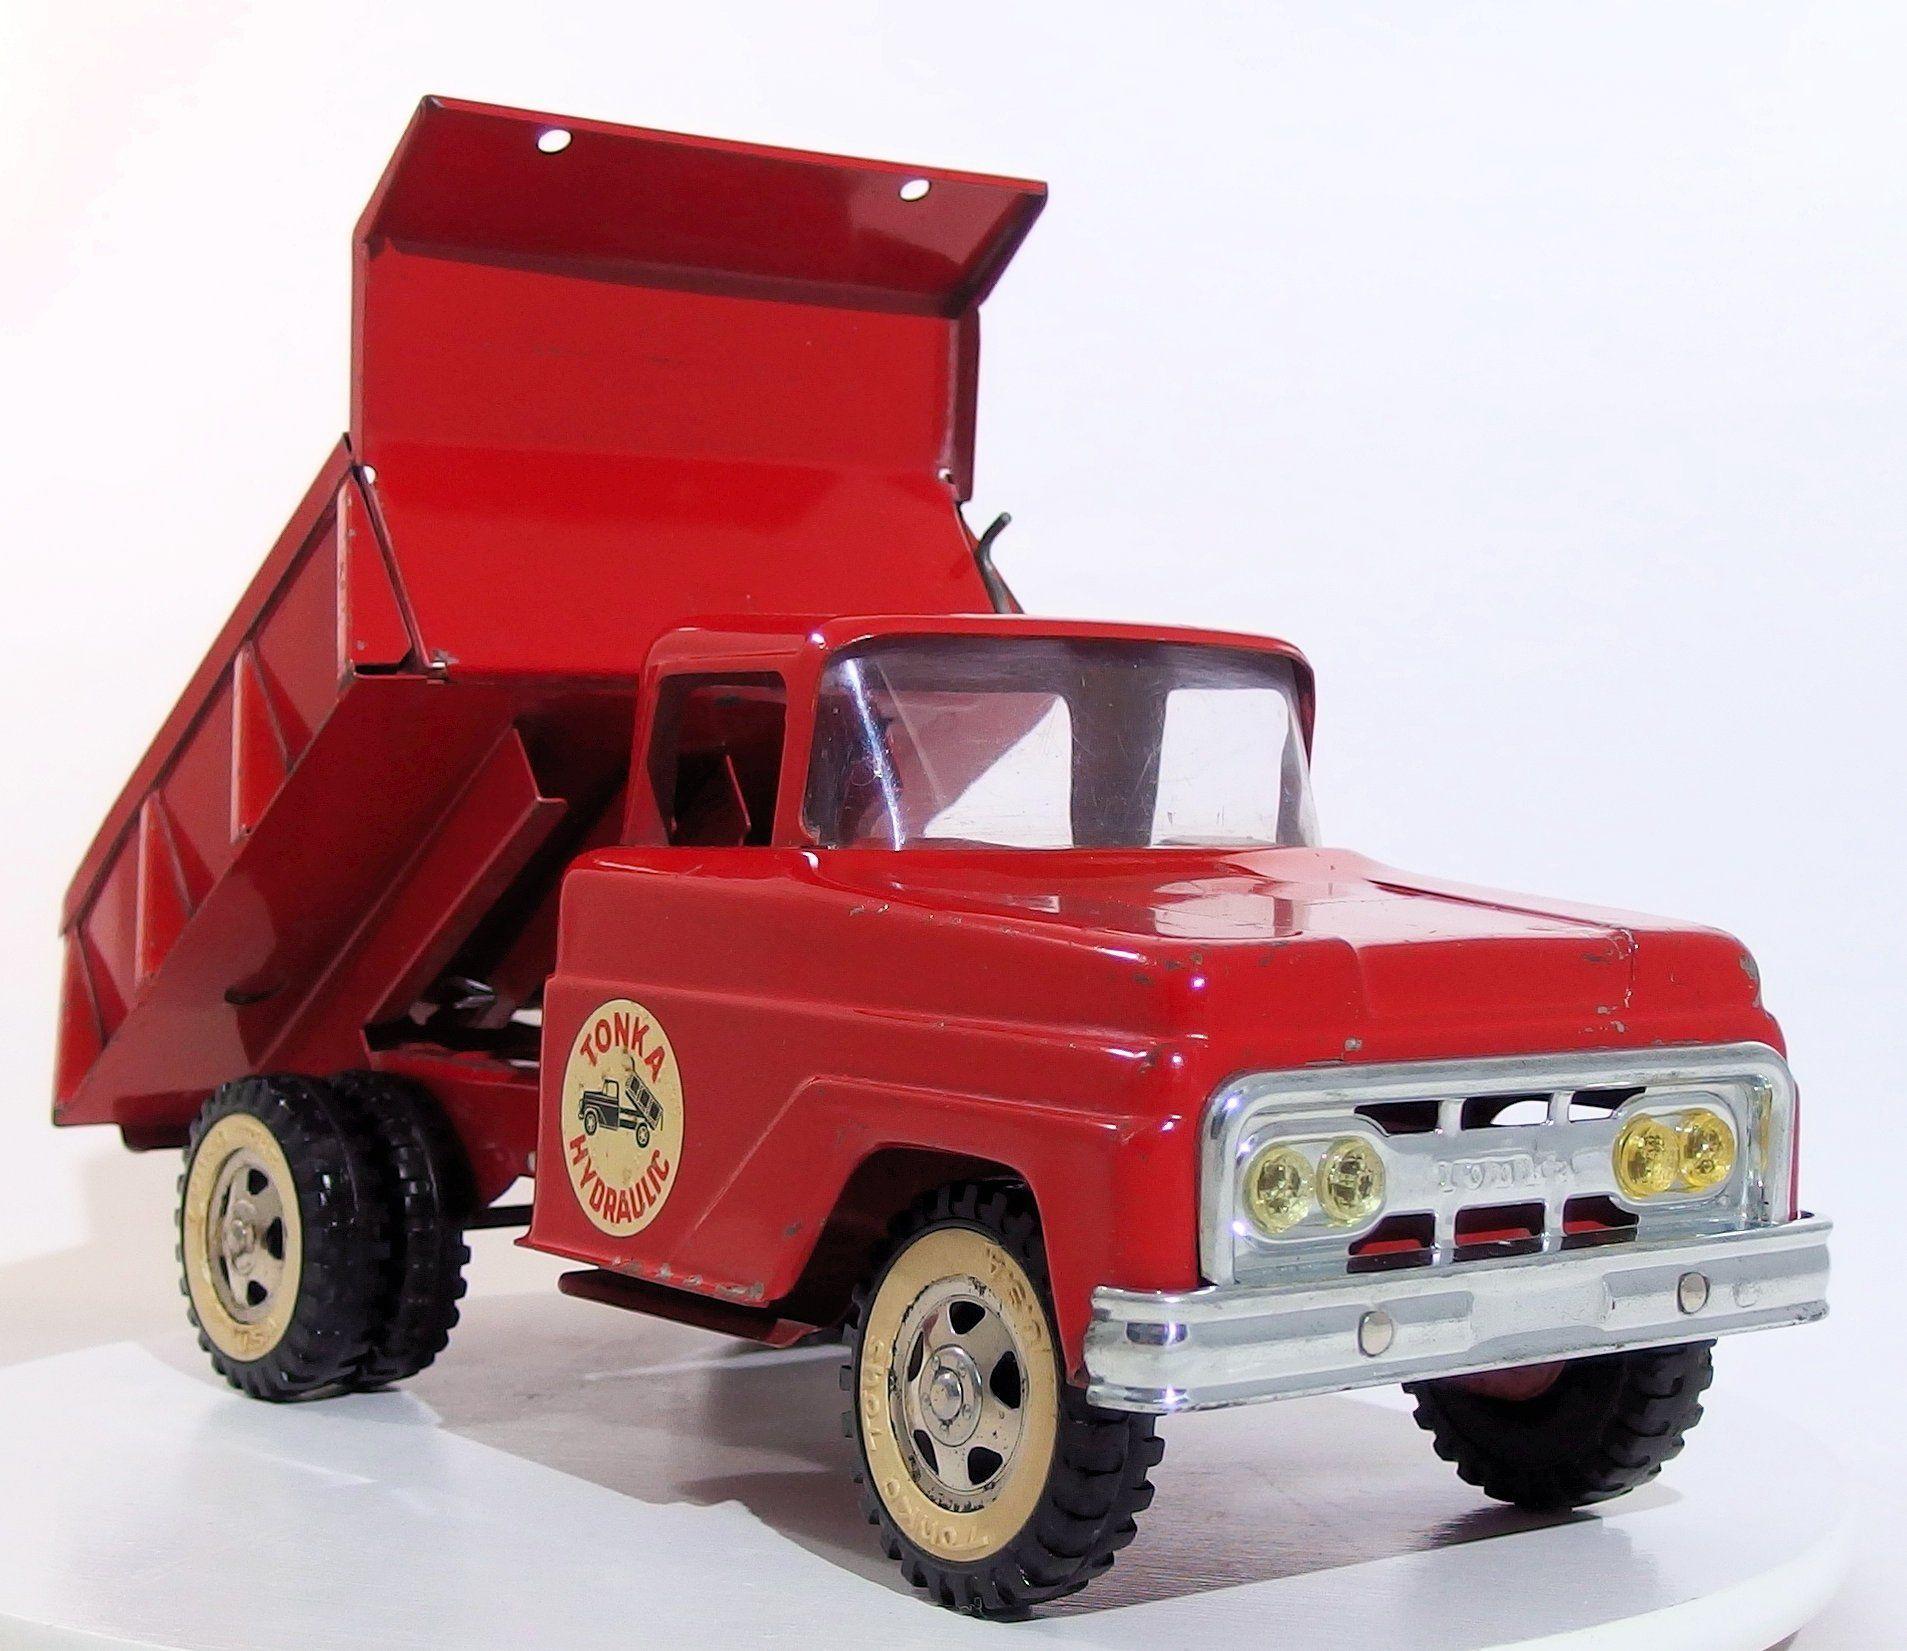 Vintage Tonka 1962 Hydraulic Dump Truck | TONKA TRUCKS and TRACTORS